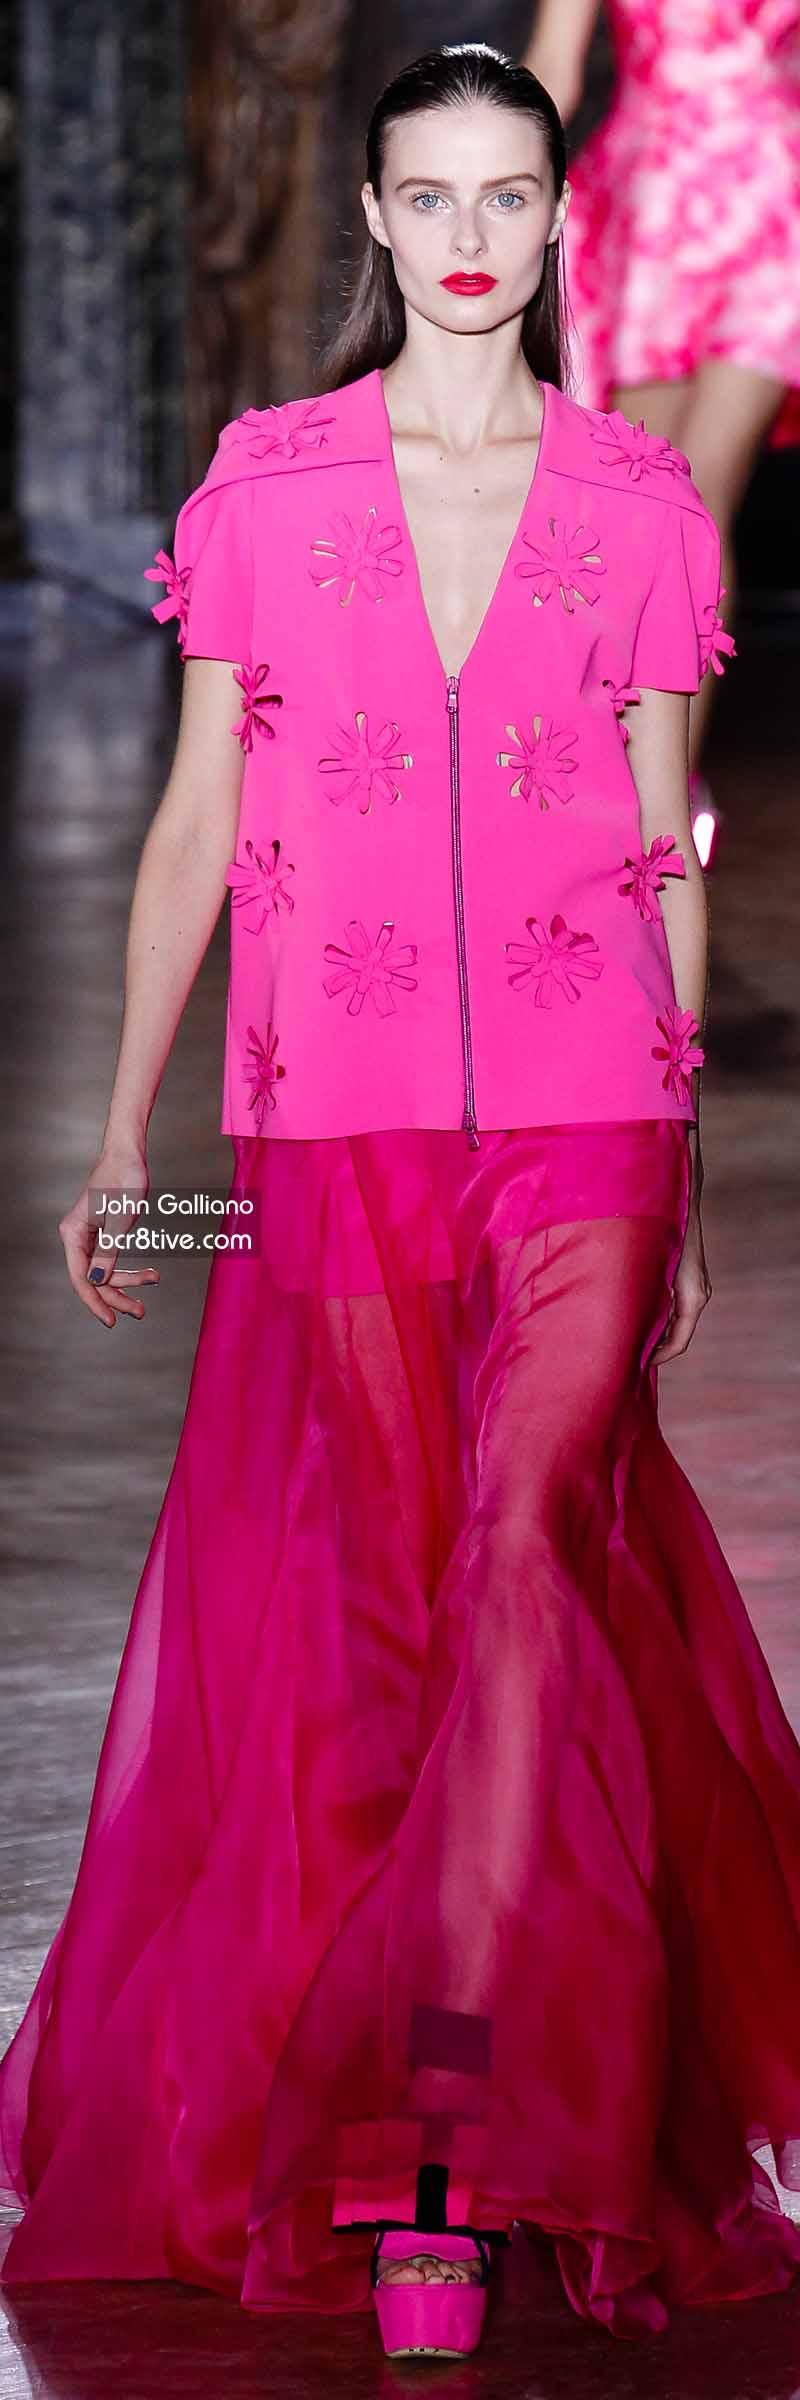 John Galliano - Hot Pink